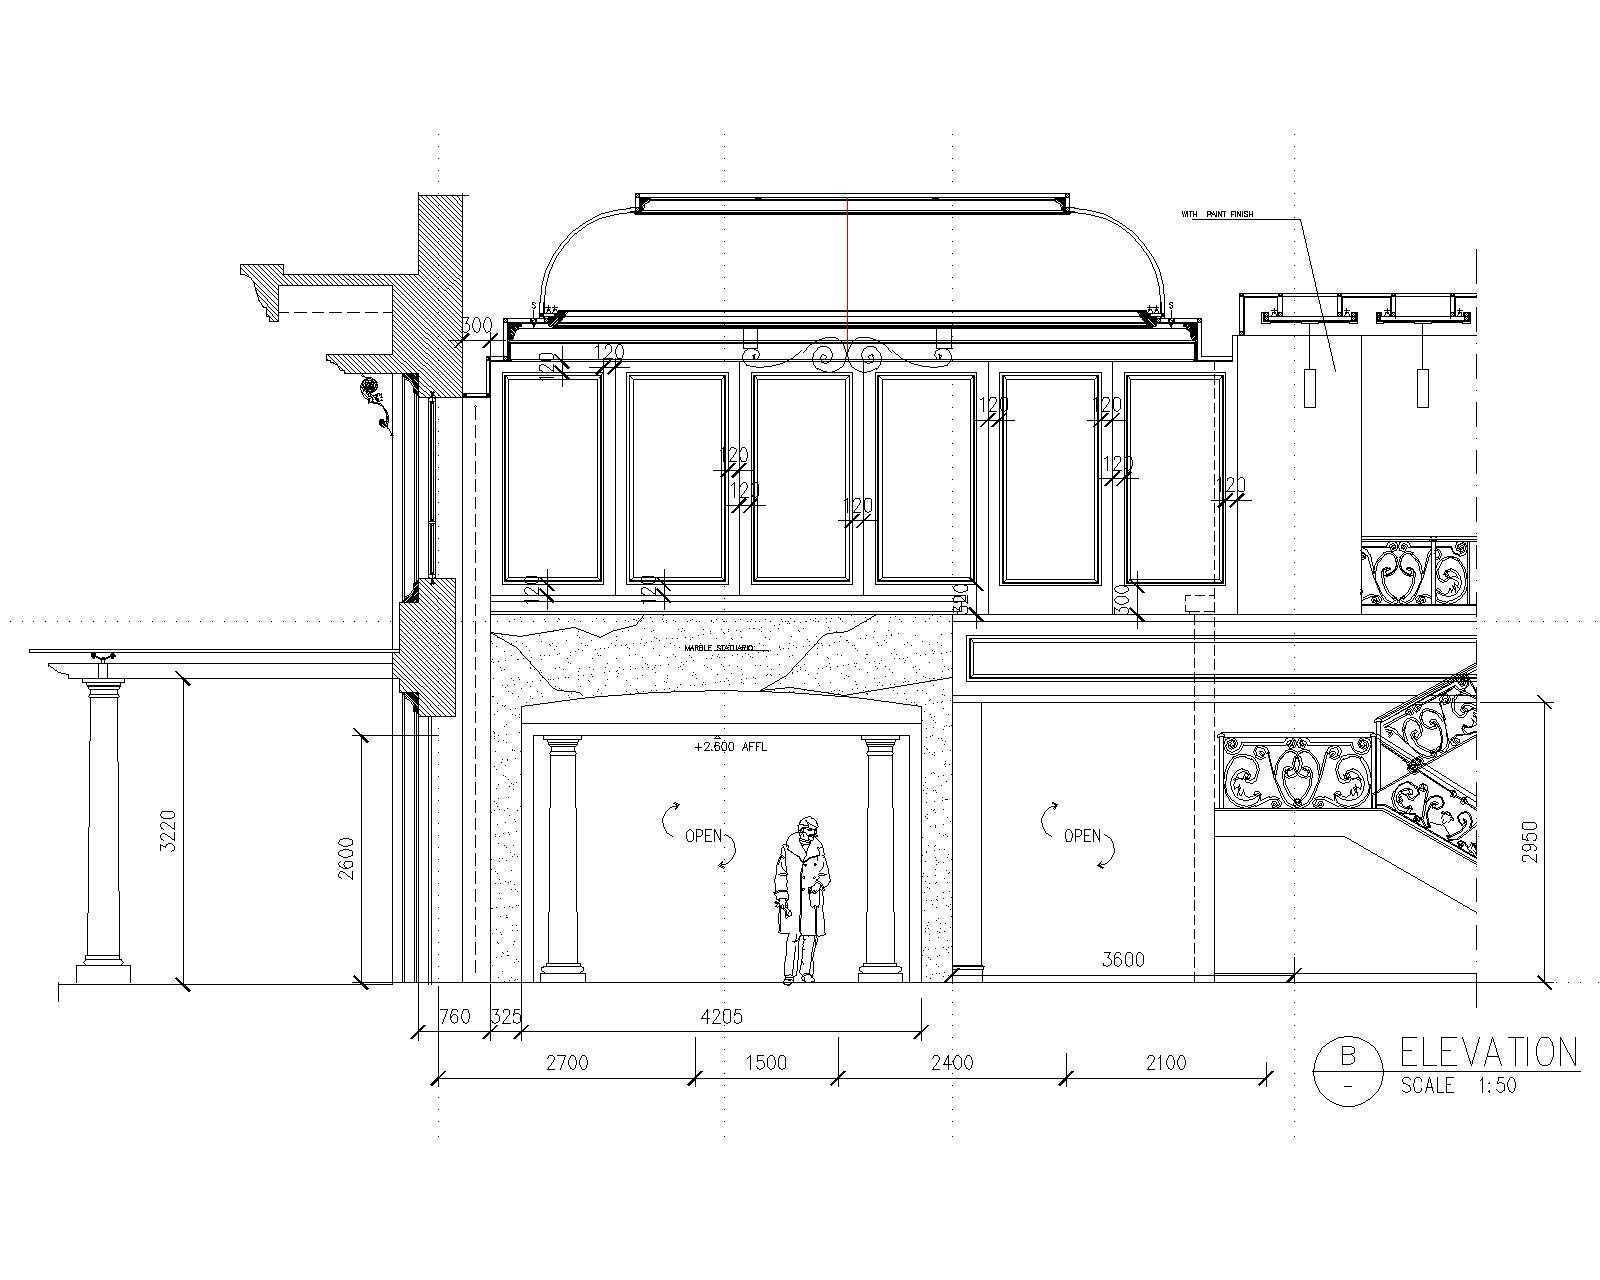 A N J A R S I T E K Classic House - Renon / Bali Renon, South Denpasar, Denpasar City, Bali, Indonesia Renon, South Denpasar, Denpasar City, Bali, Indonesia Section-Drawing-2 Klasik  36080